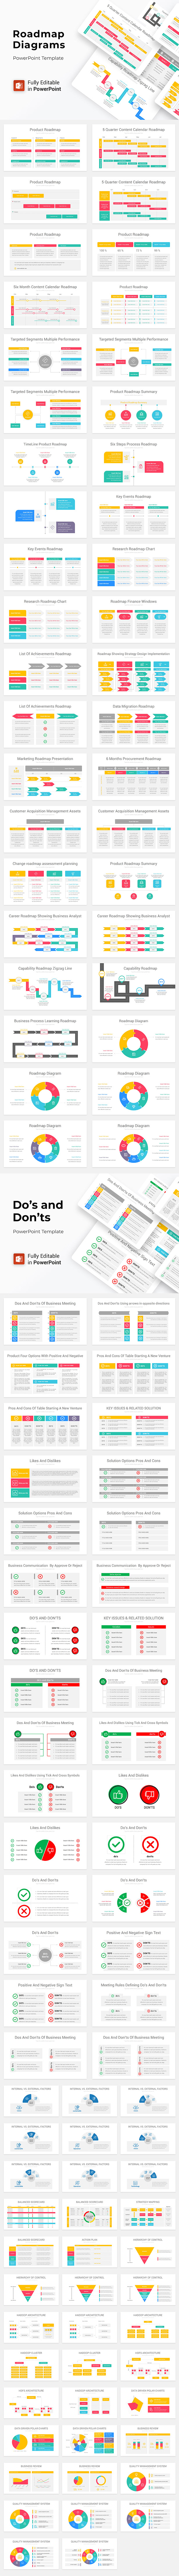 Slide Deck - Multipurpose PowerPoint Template - 12